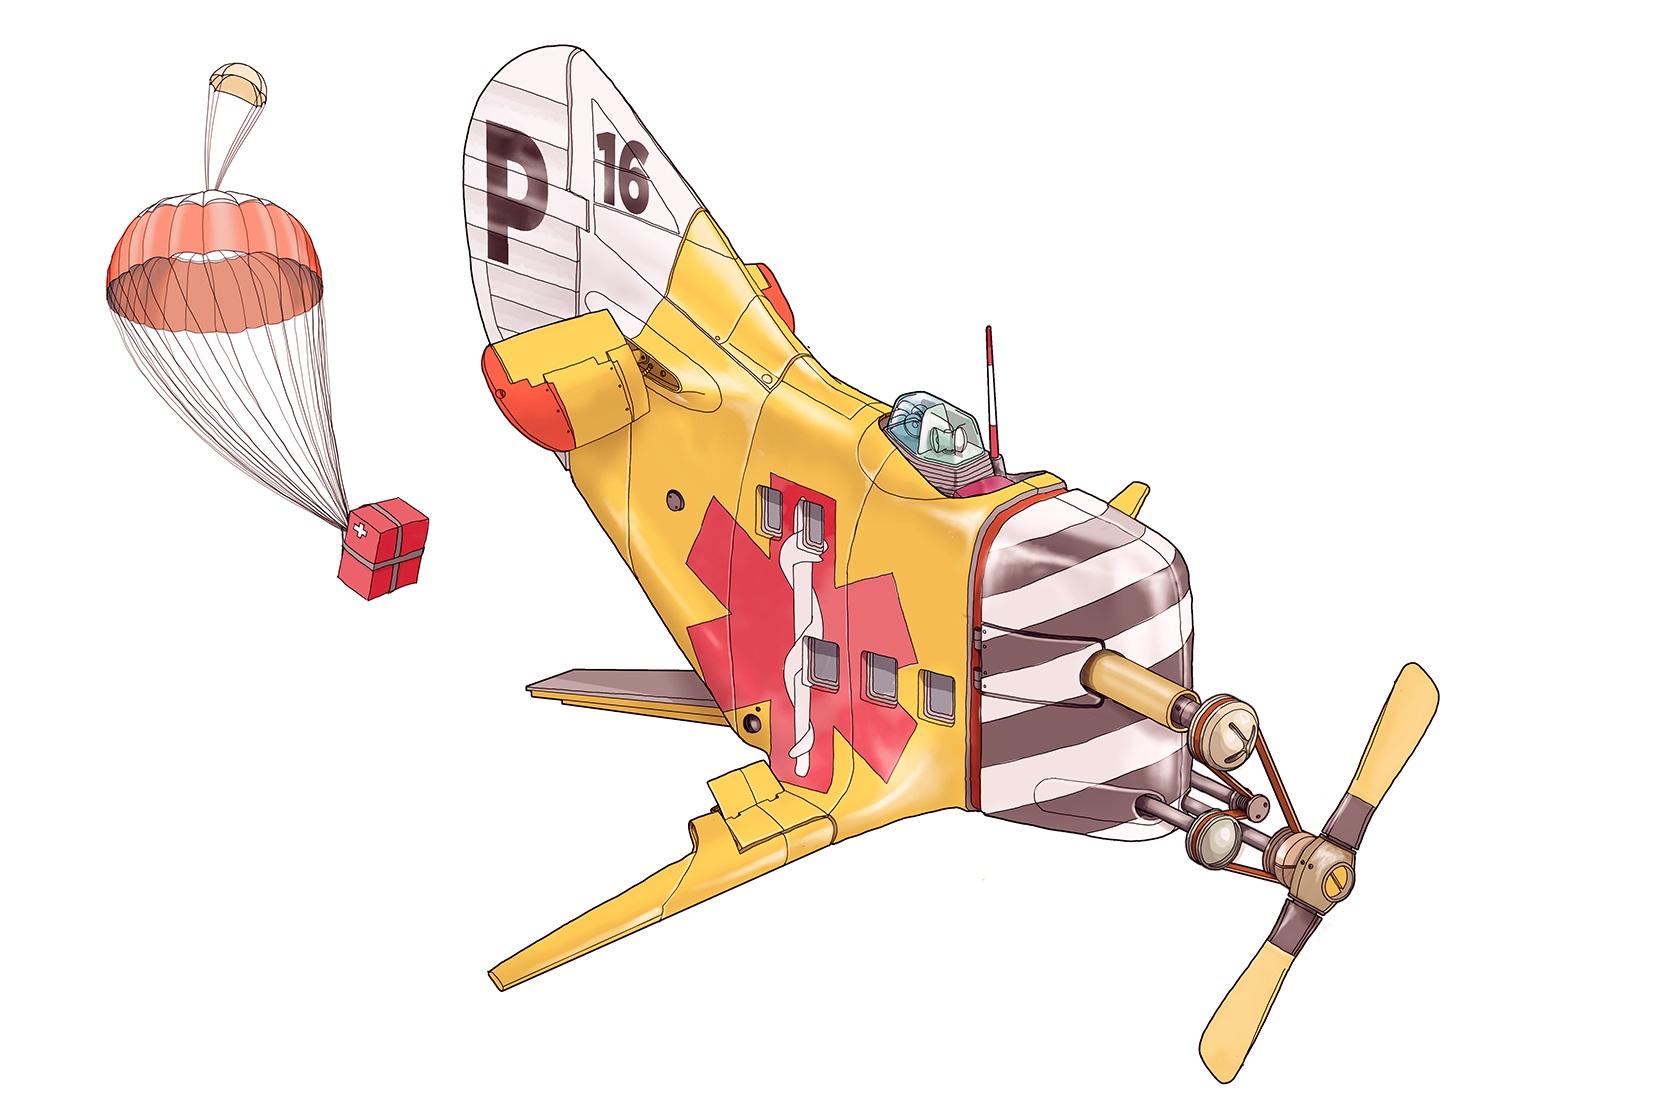 Paramedic Pulley Plane